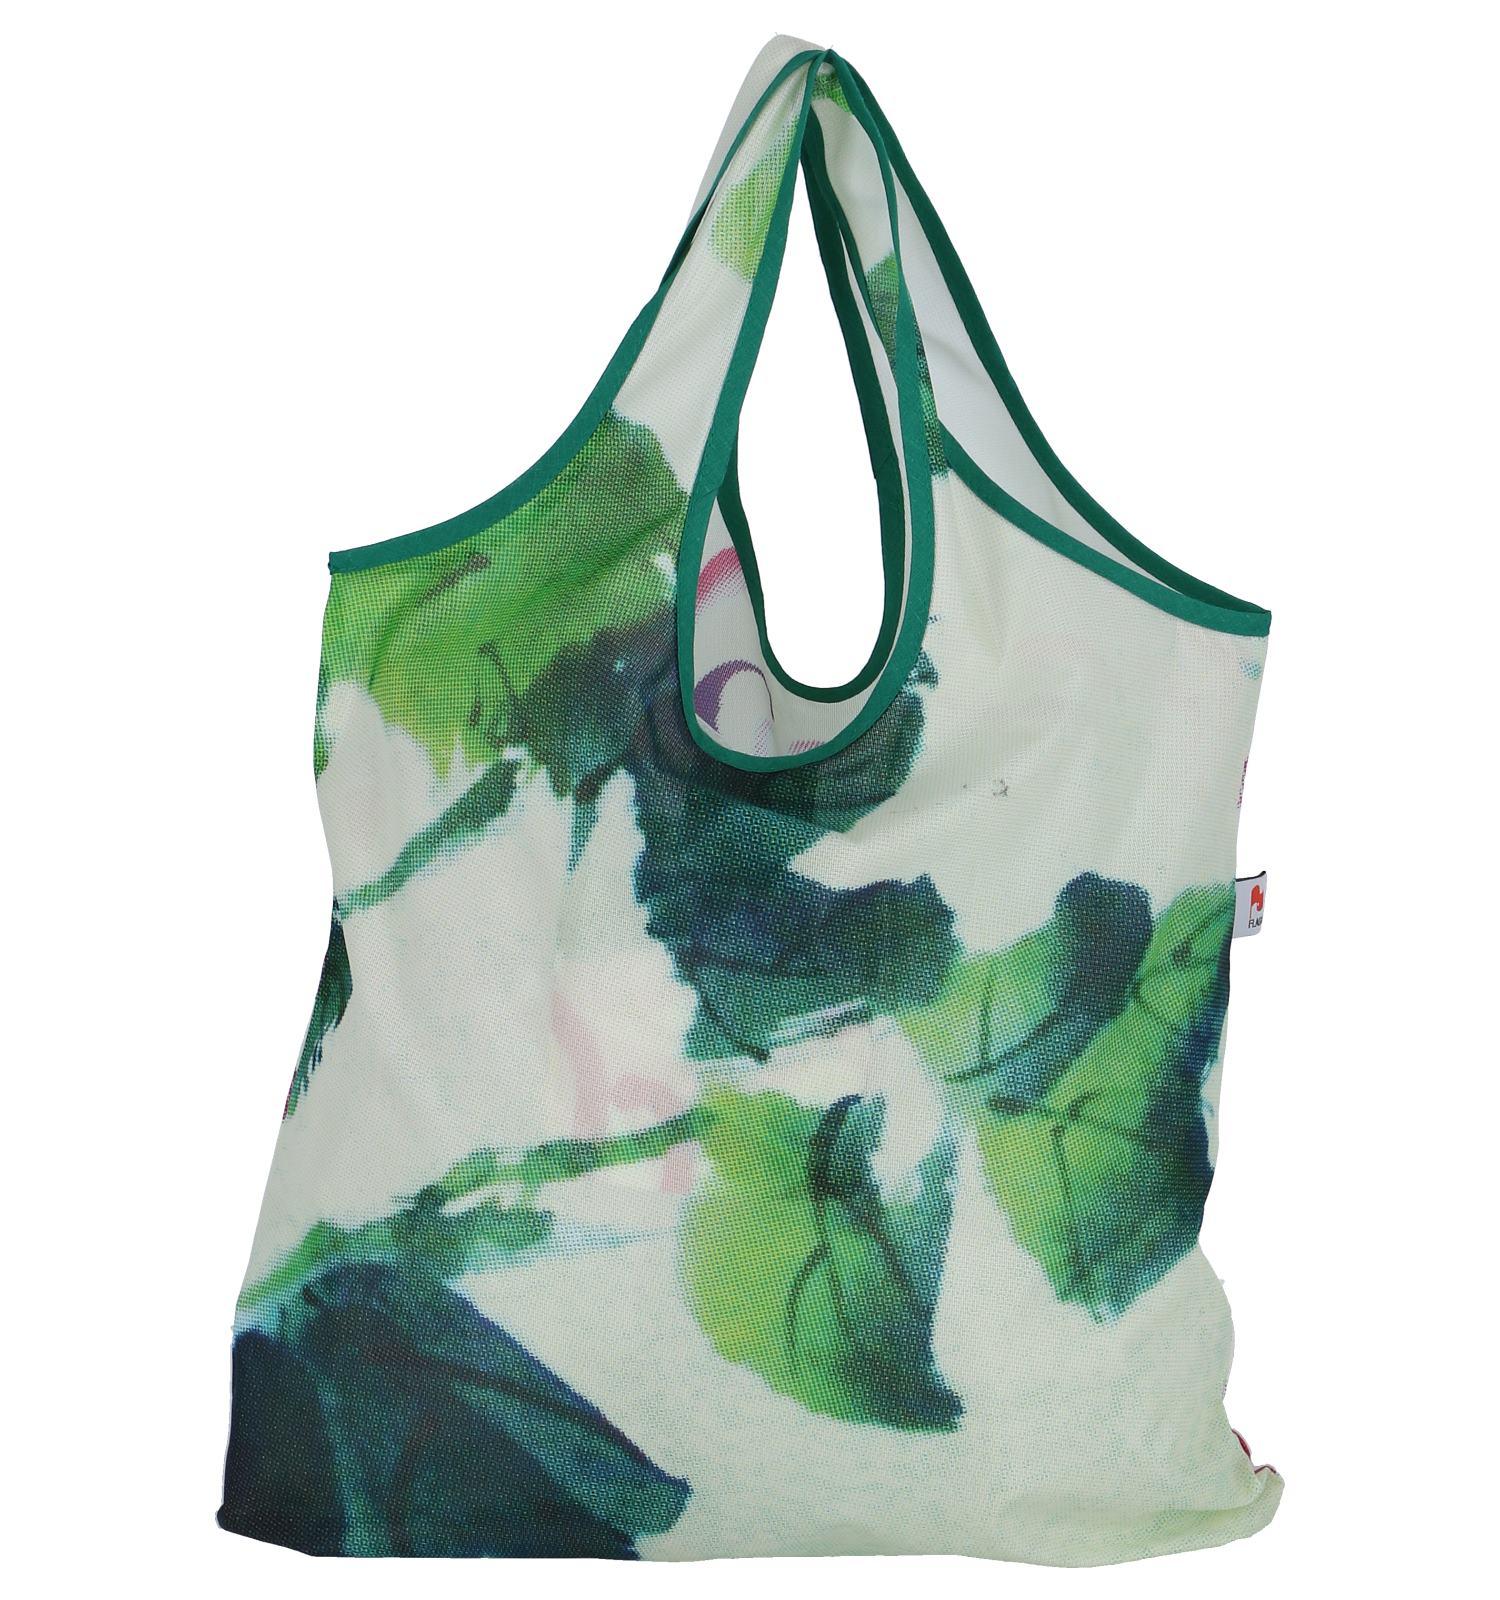 Flagbag Flagbag Flagbag Multicolor Shopper Flagbag Shopper Multicolor Shopper Shopper Multicolor Multicolor Flagbag W2EHYID9